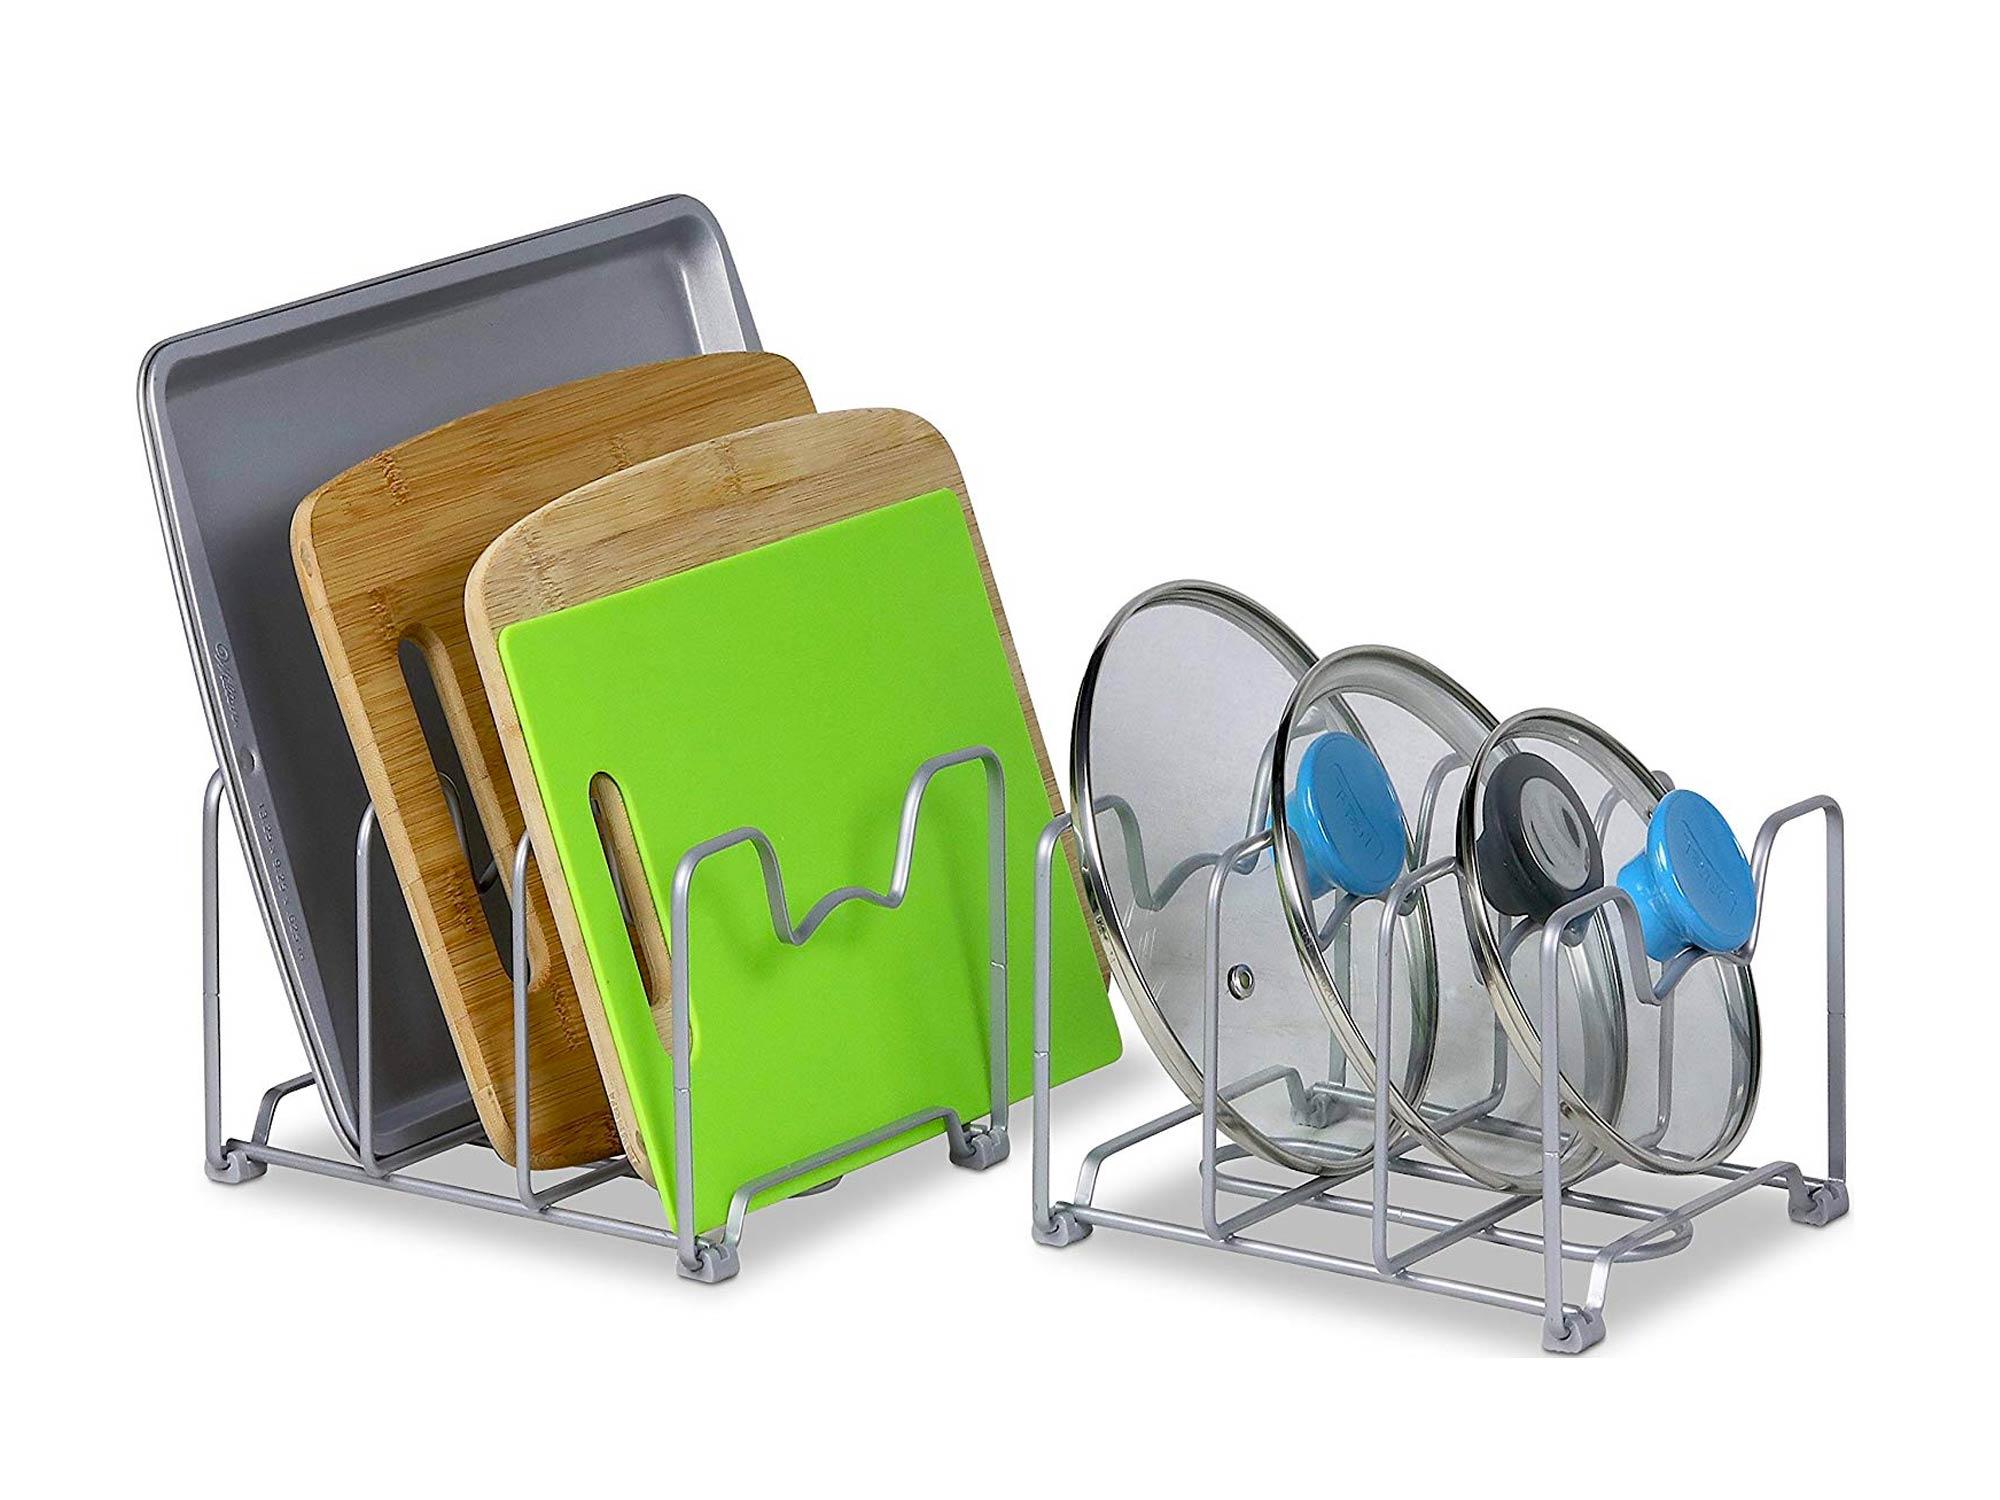 Simple Houseware Kitchen Cabinet Pantry and Bakeware Organizer Rack Holder